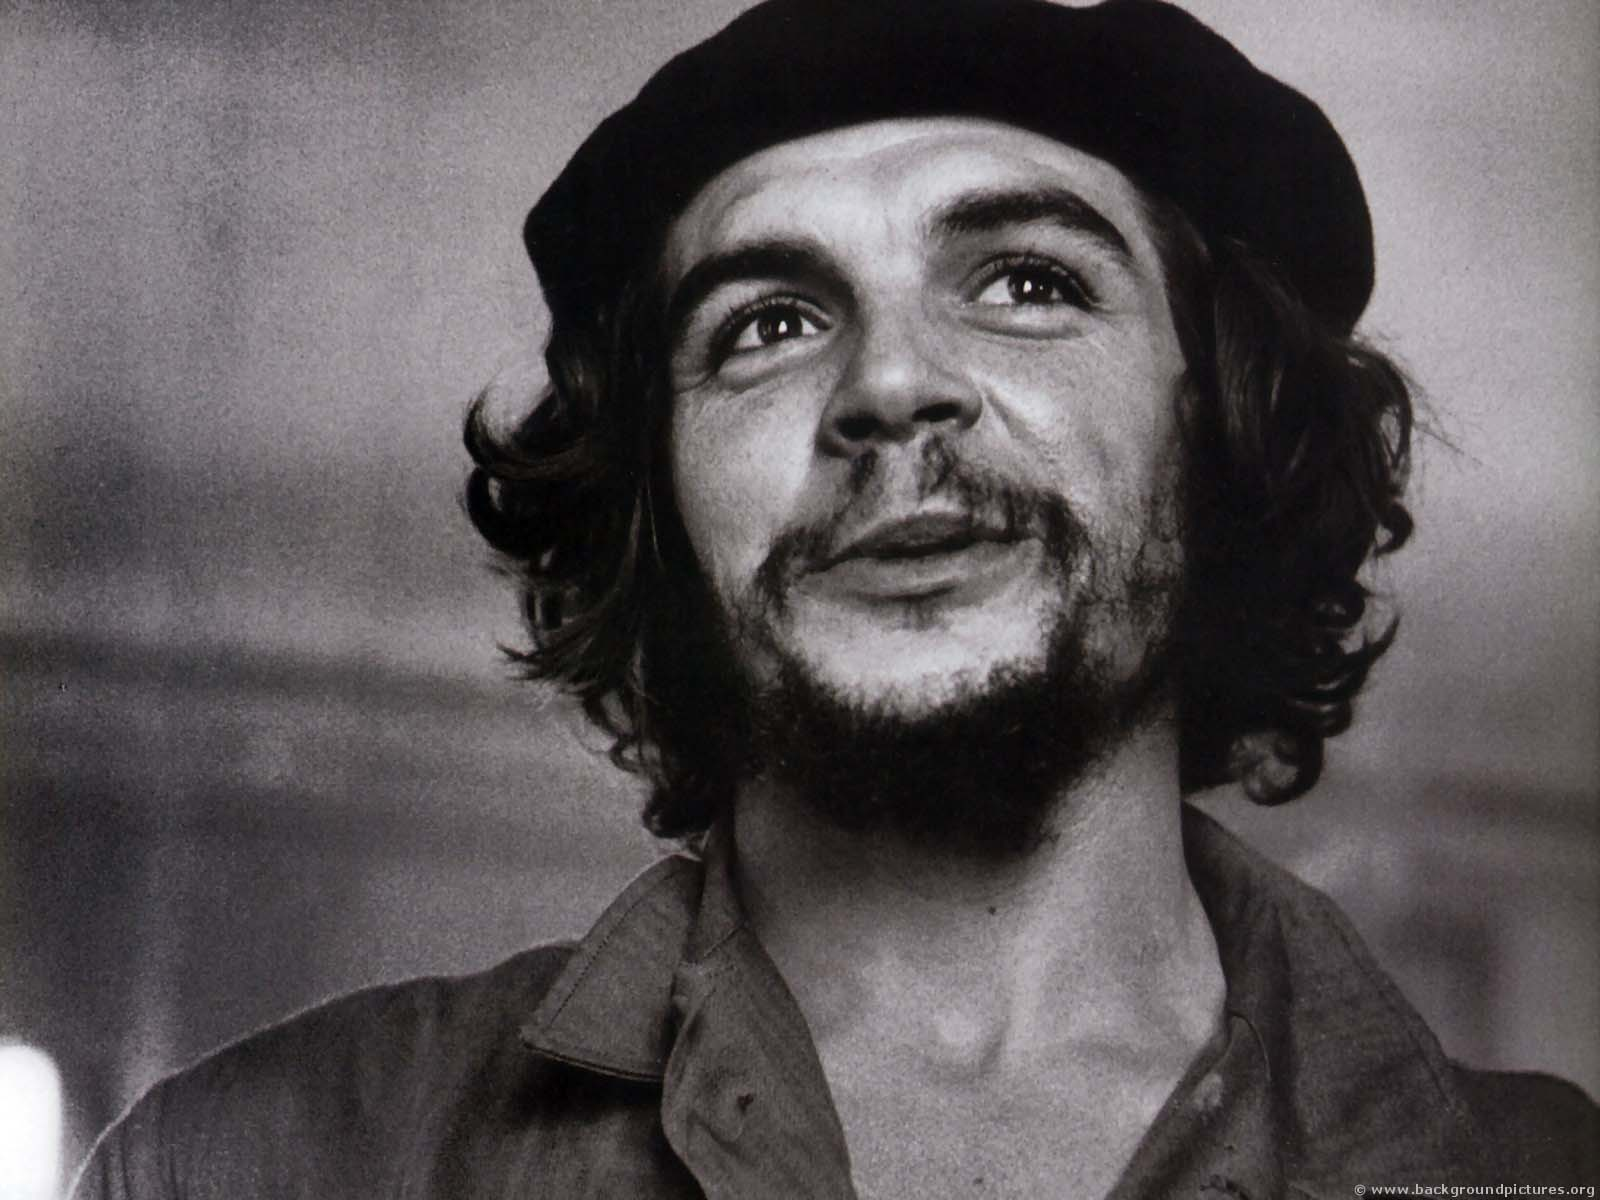 Ernesto ¨Che¨ Guevara: assassinated on October 9, 1967